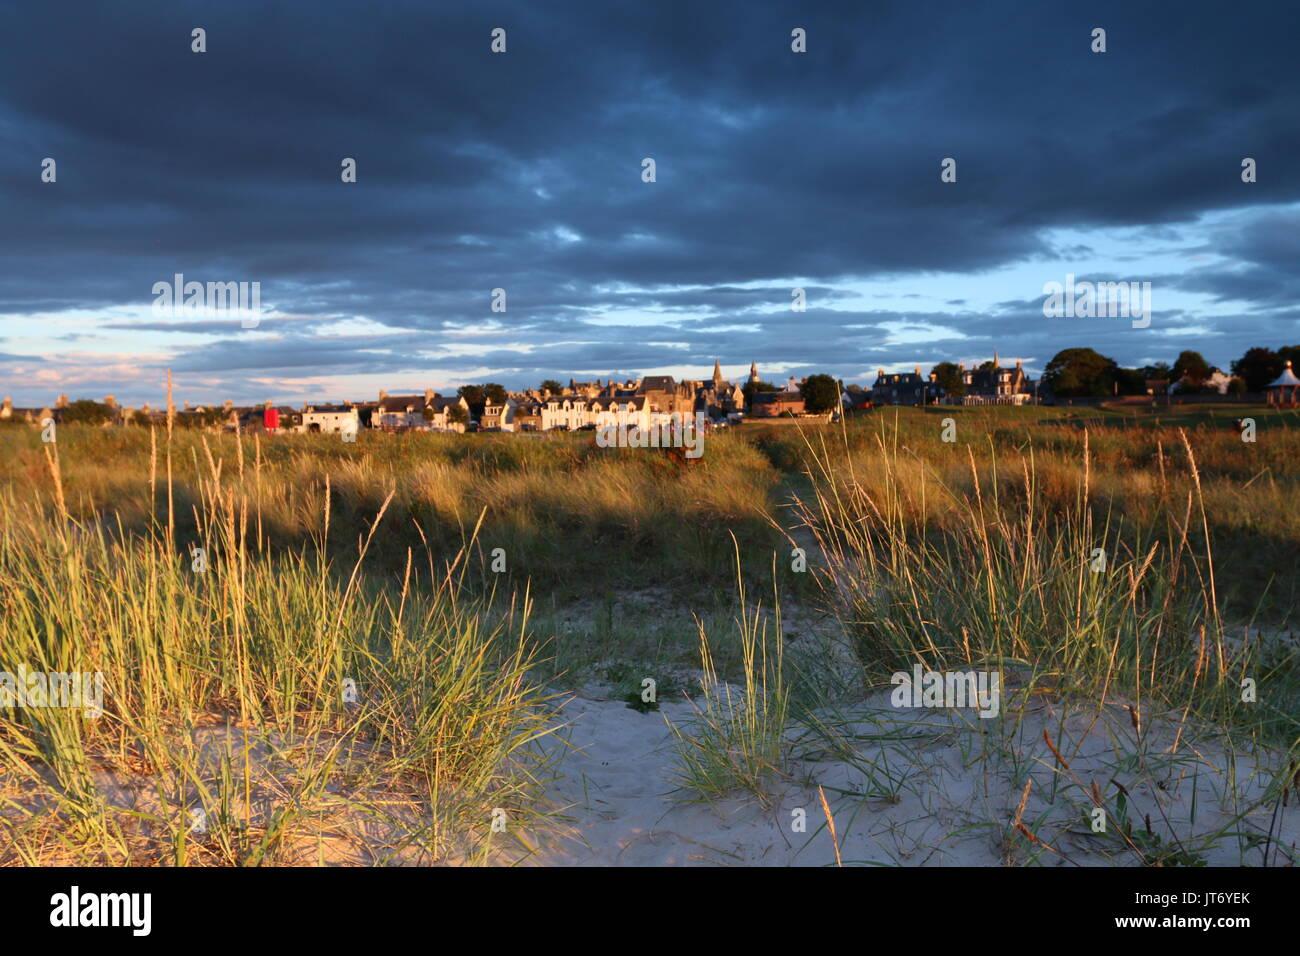 Nairn seen from beach in stunning light - Stock Image